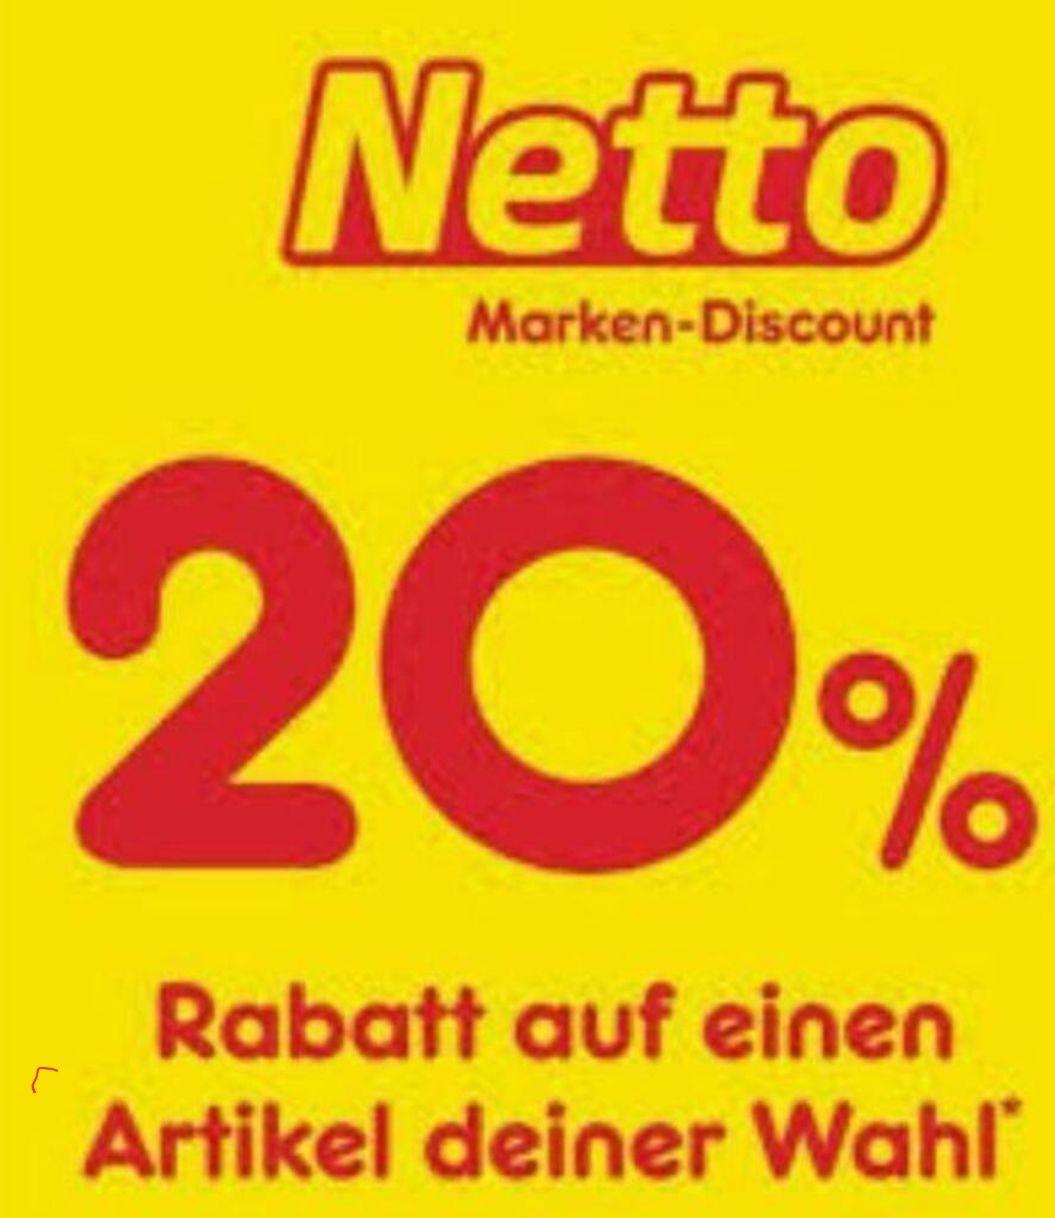 [Netto MD] Rabatt Coupons KW52 (21.12. - 26.12.), bundesweit einsetzbar